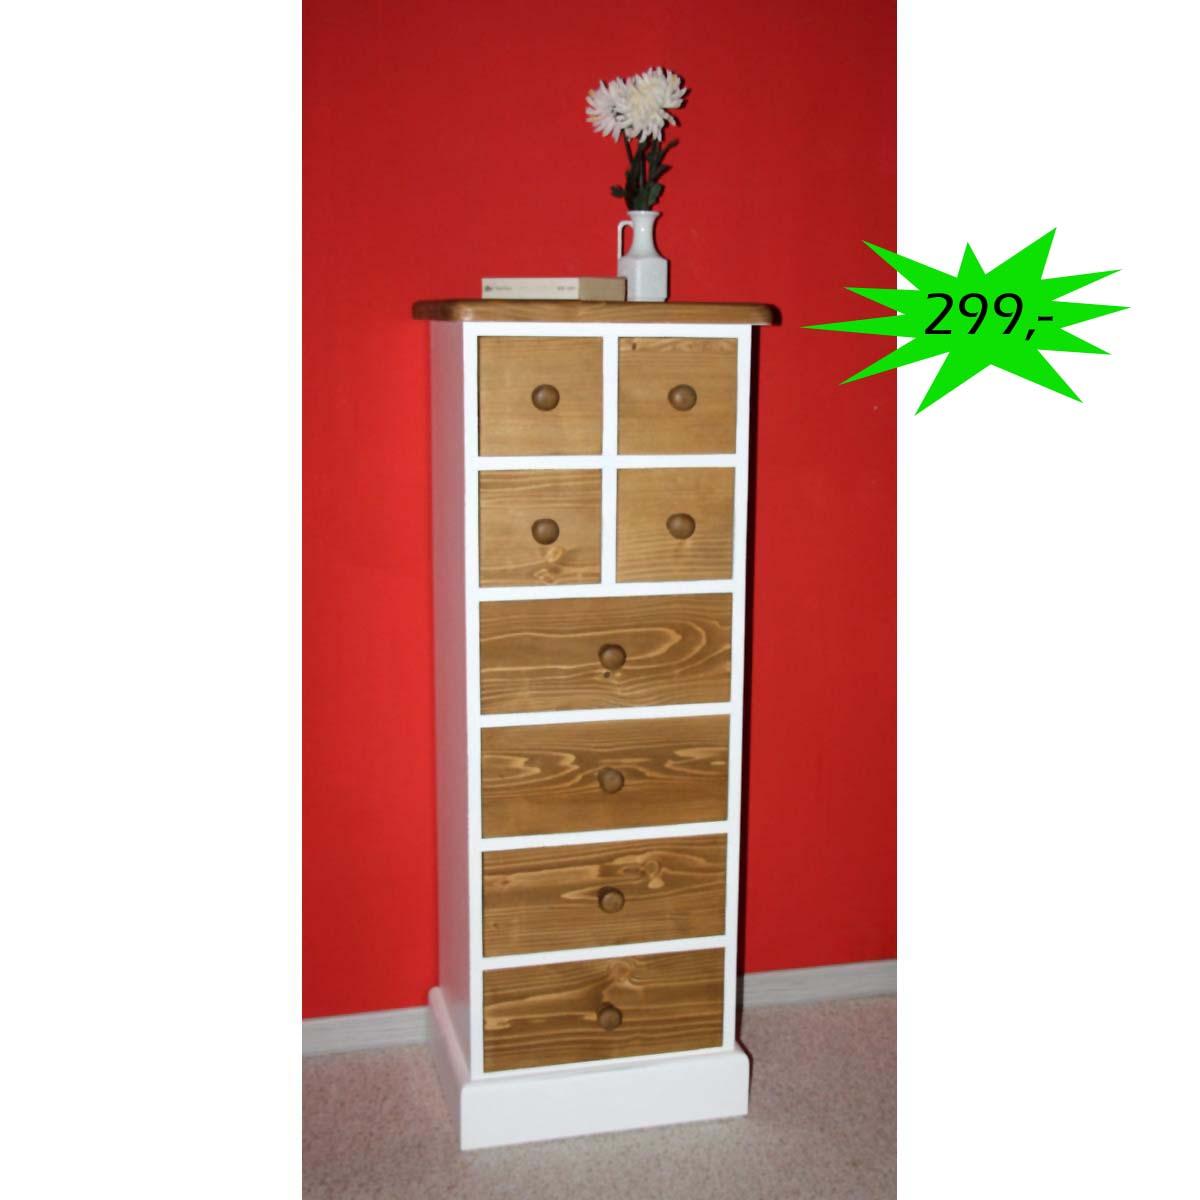 schubladenkommode vintage weiss ps89 massivholz m bel in goslar massivholz m bel in goslar. Black Bedroom Furniture Sets. Home Design Ideas